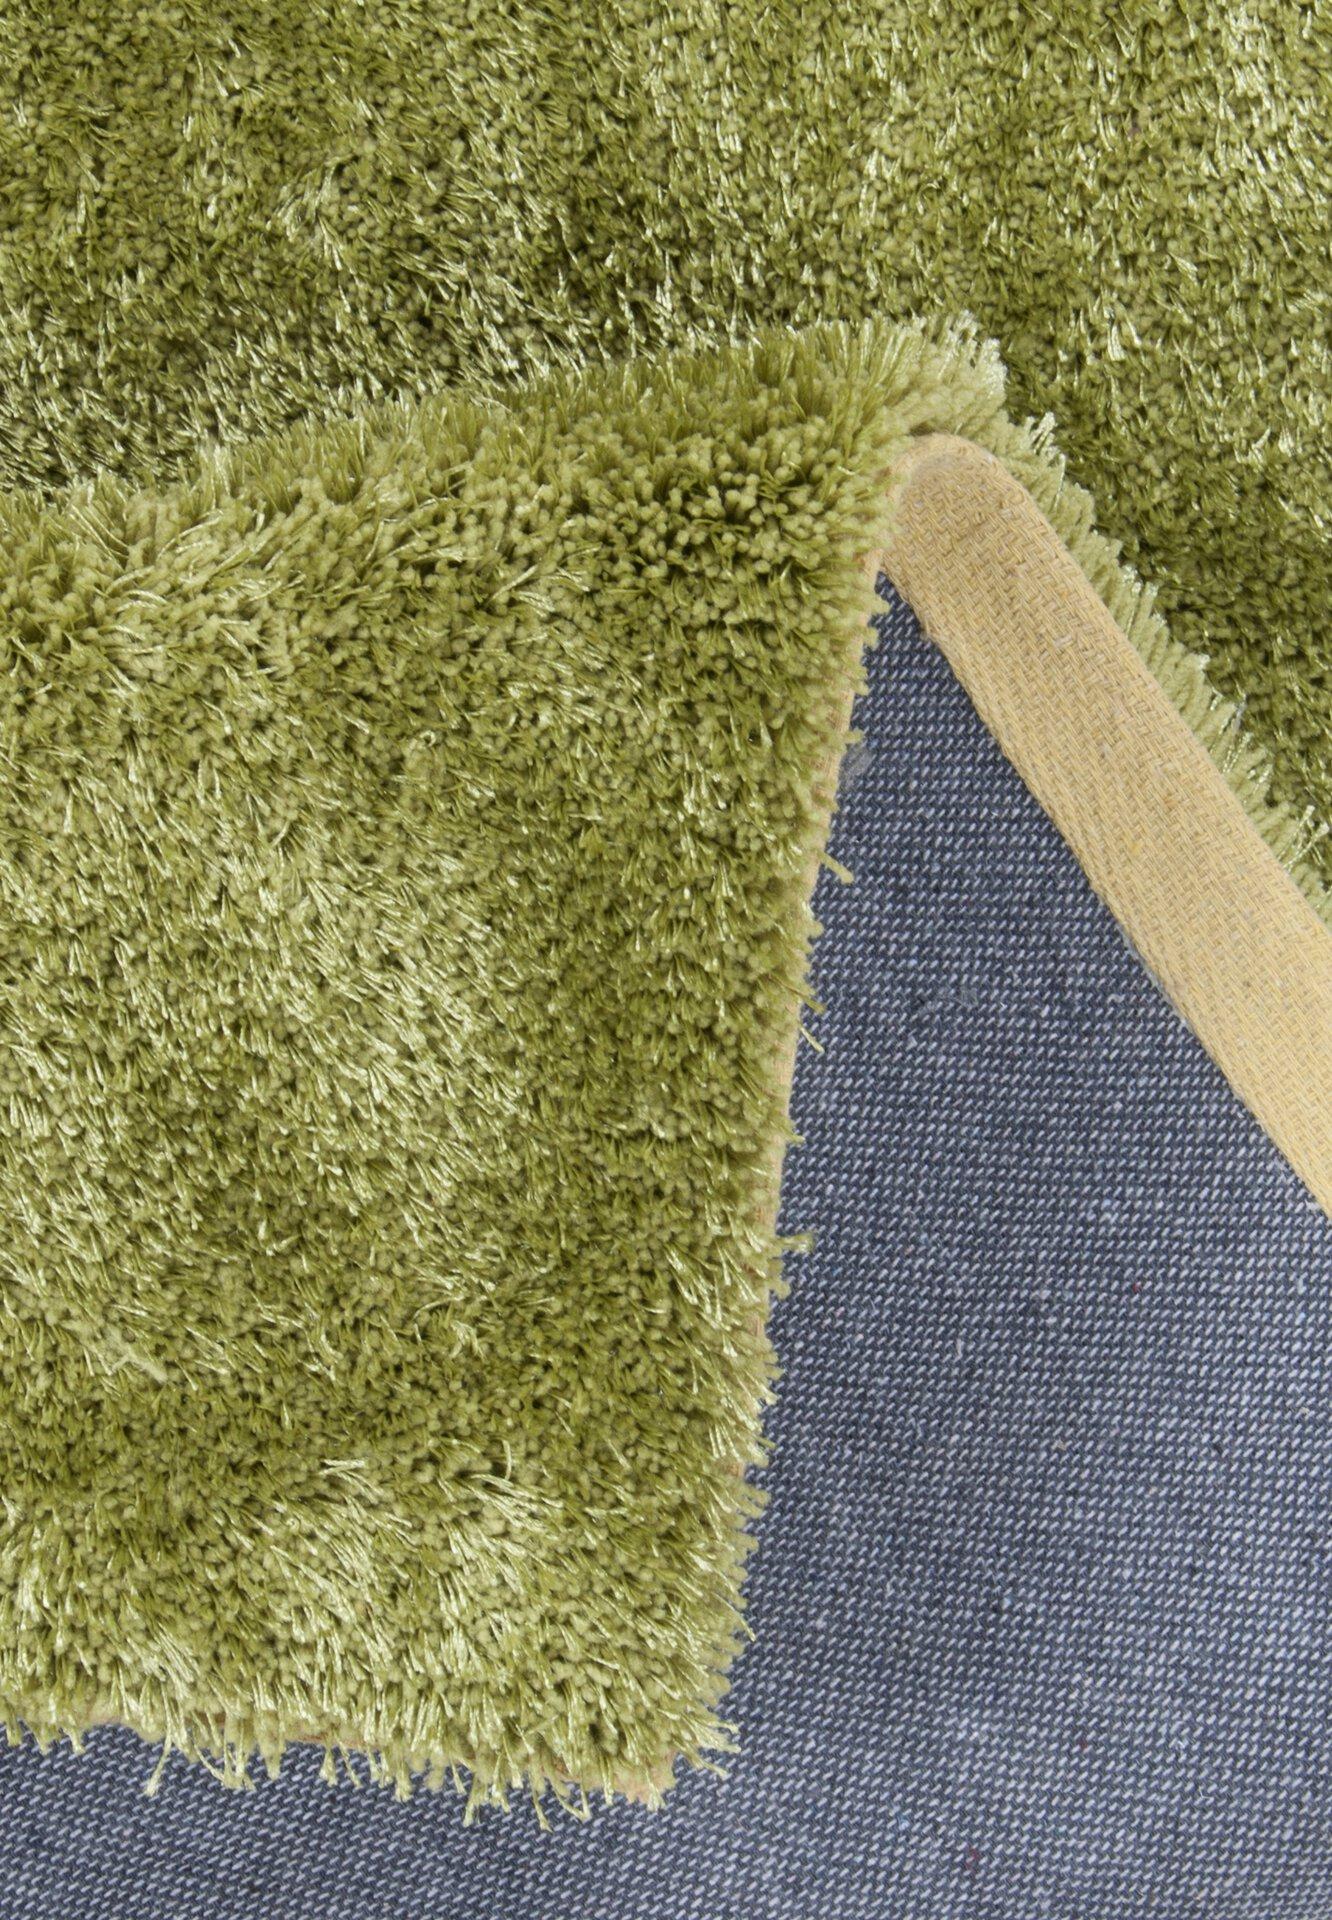 Handtuftteppich Alessandro Gino Falcone Textil grün 50 x 80 cm